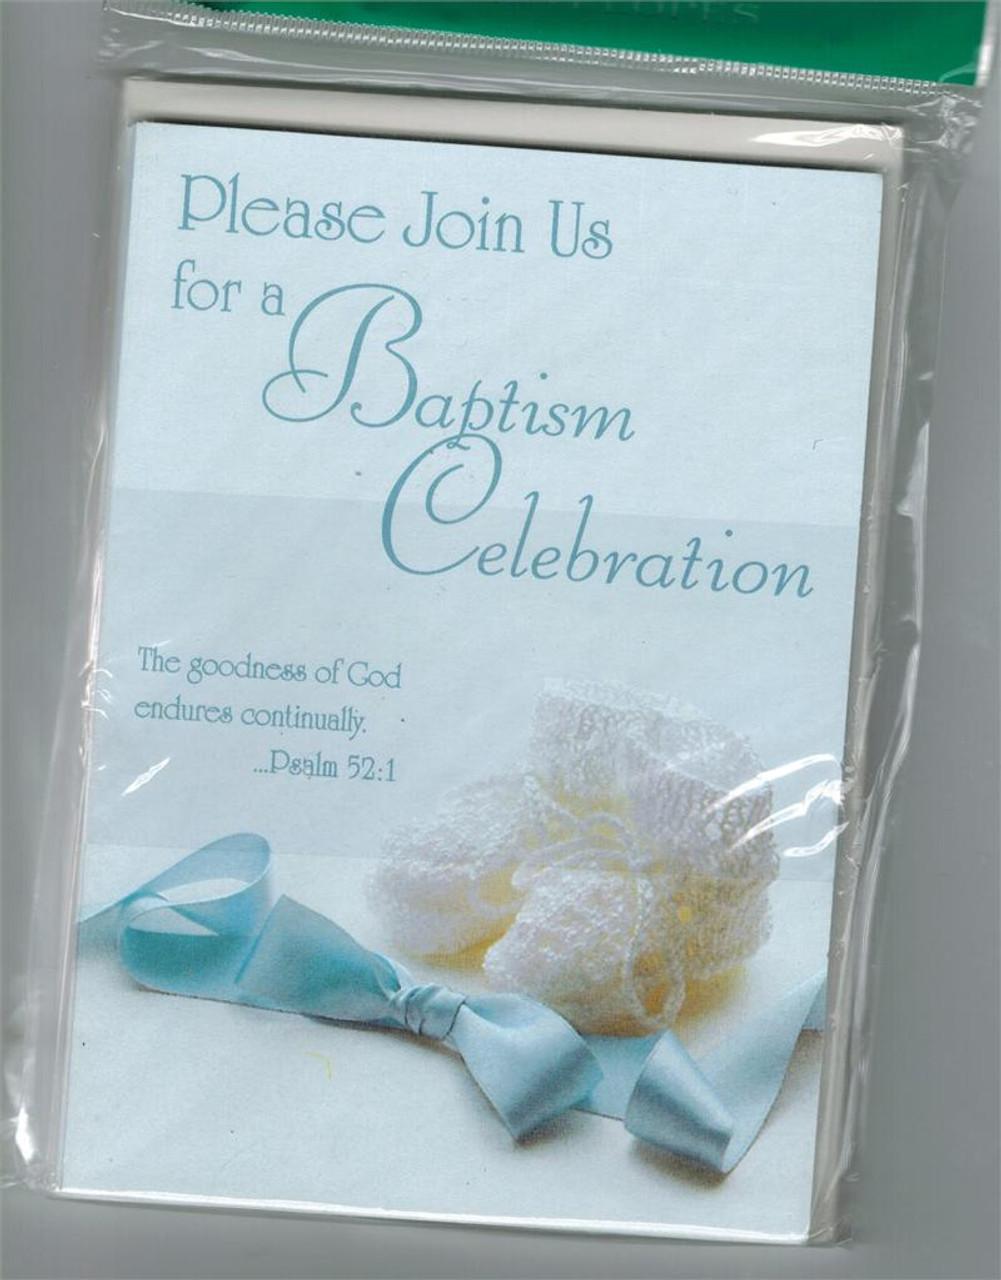 Baptism Celebration Invitation for a Boy